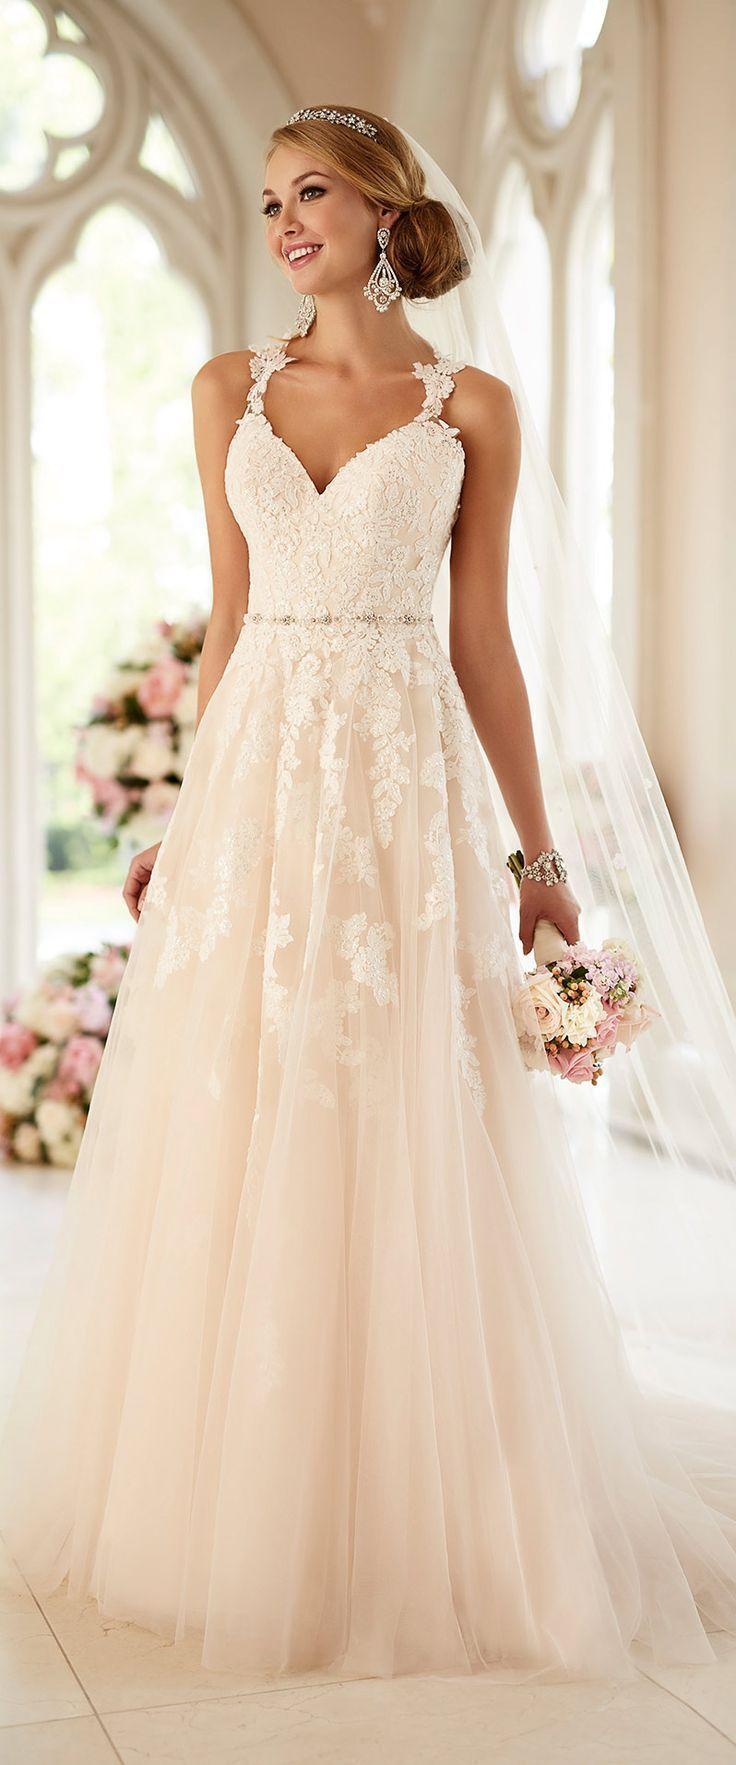 monique lhuillier wedding dresses nice dresses for wedding fairness wedding dresses designer with sleeves zuhair murad